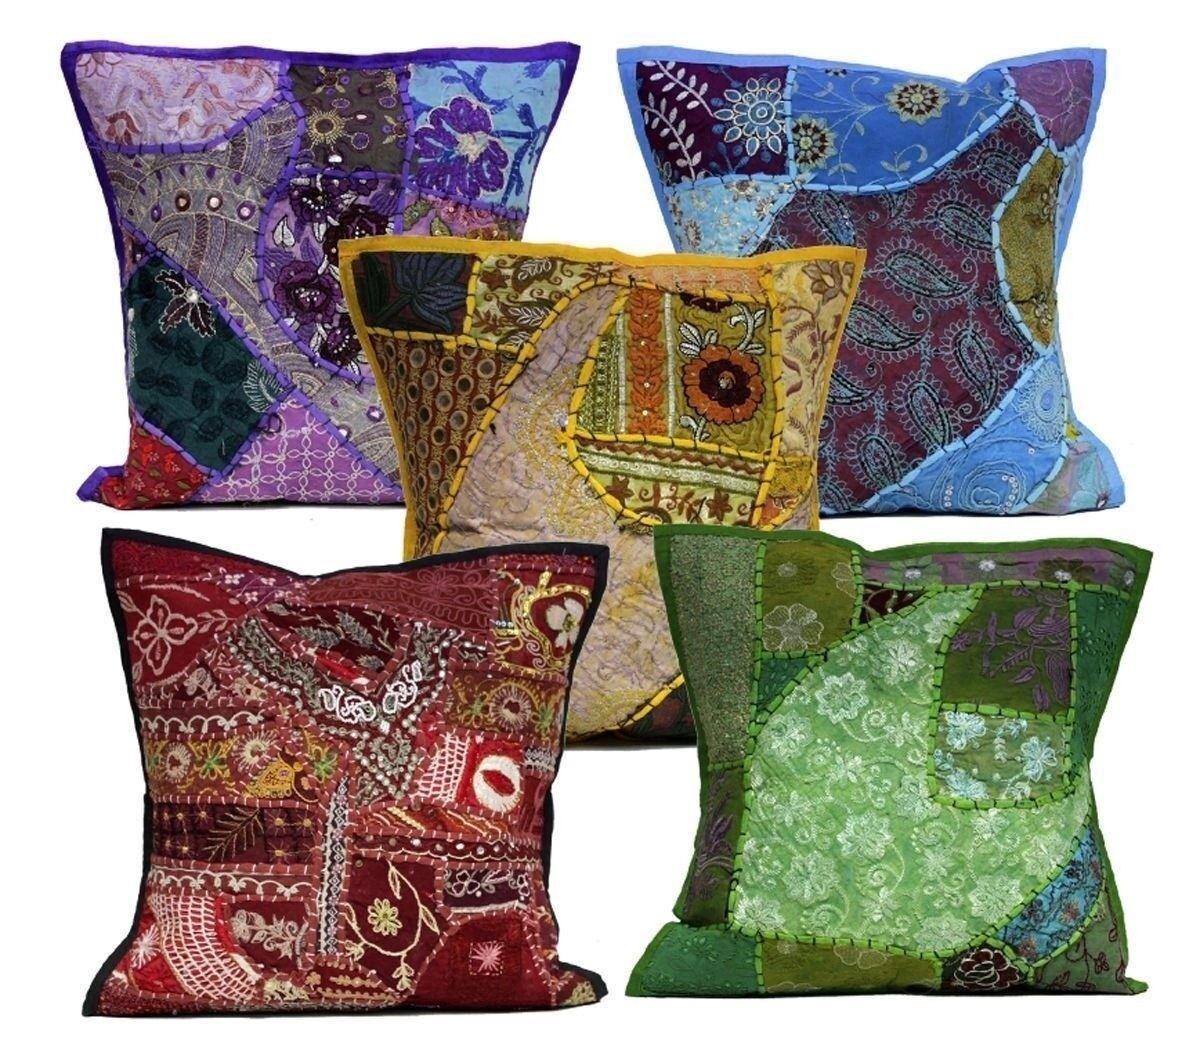 10Pcs Applique Embroidery Ethnic Patchwork Pillow Vintage Cushion Covers AIC823